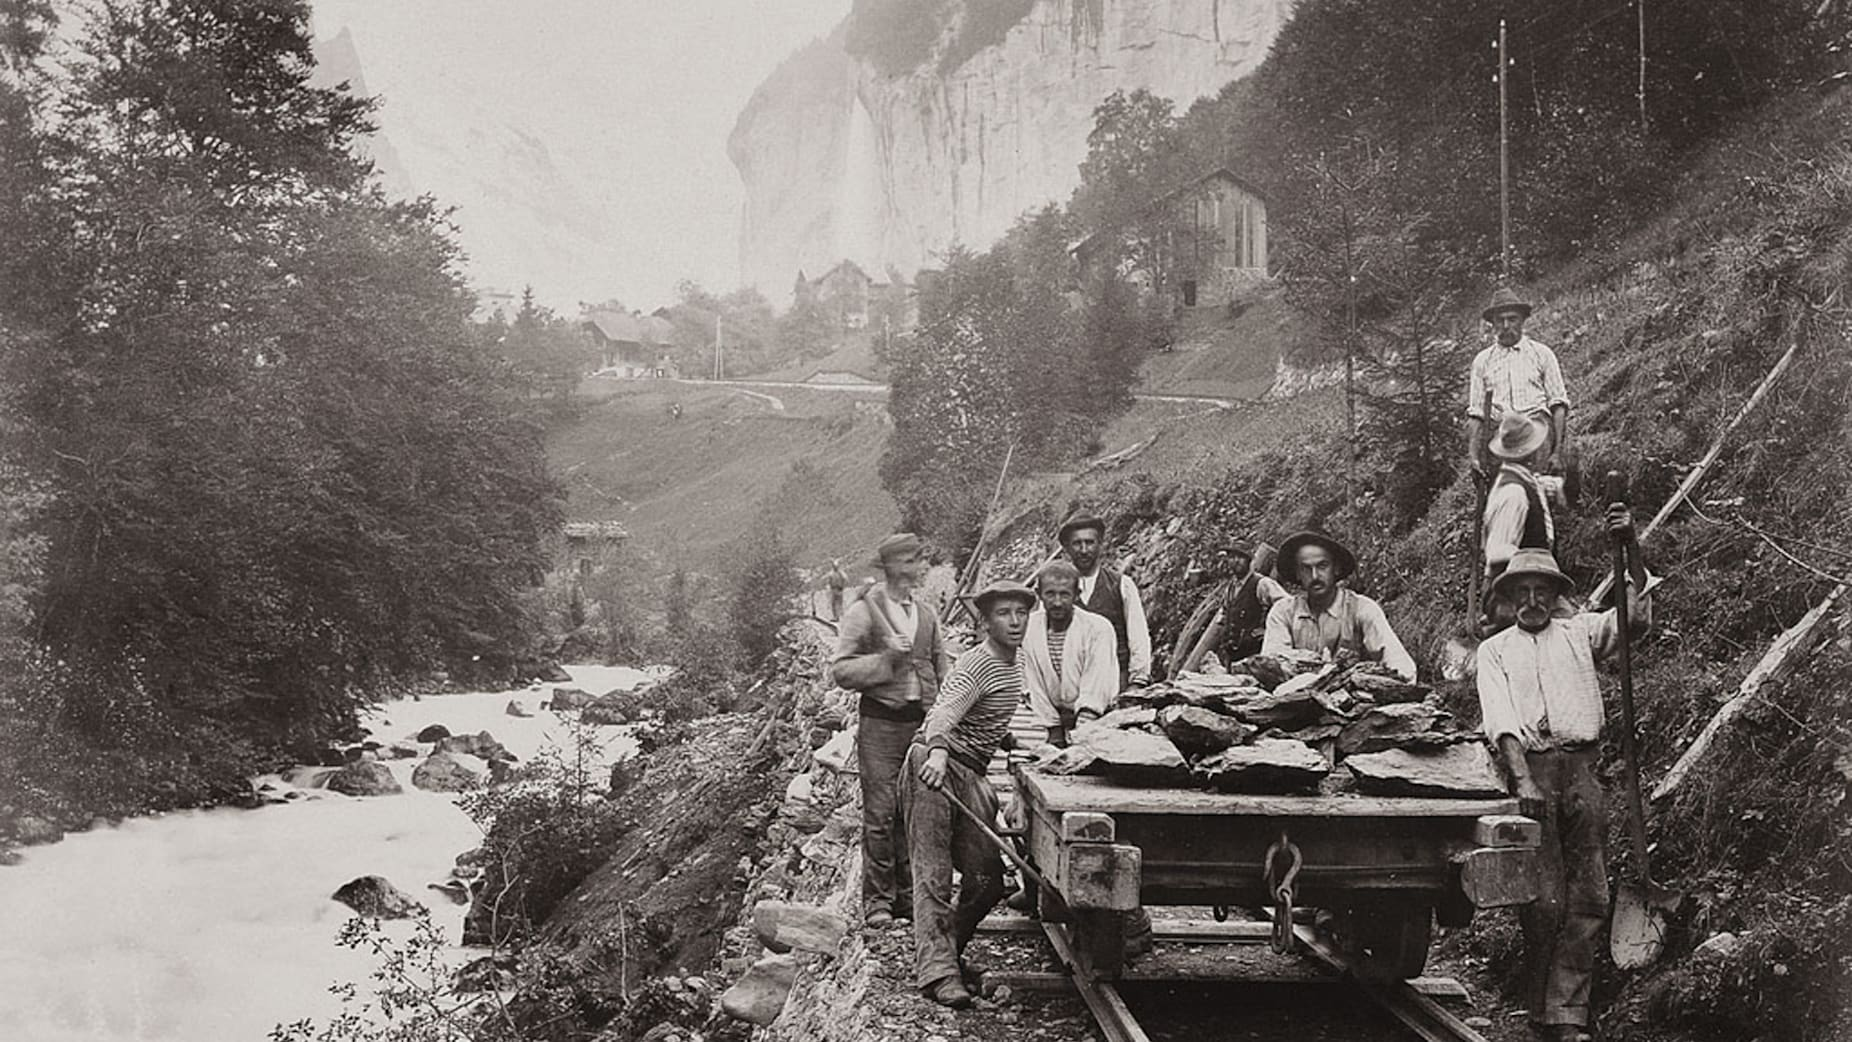 Bau der Jungfraubahn11